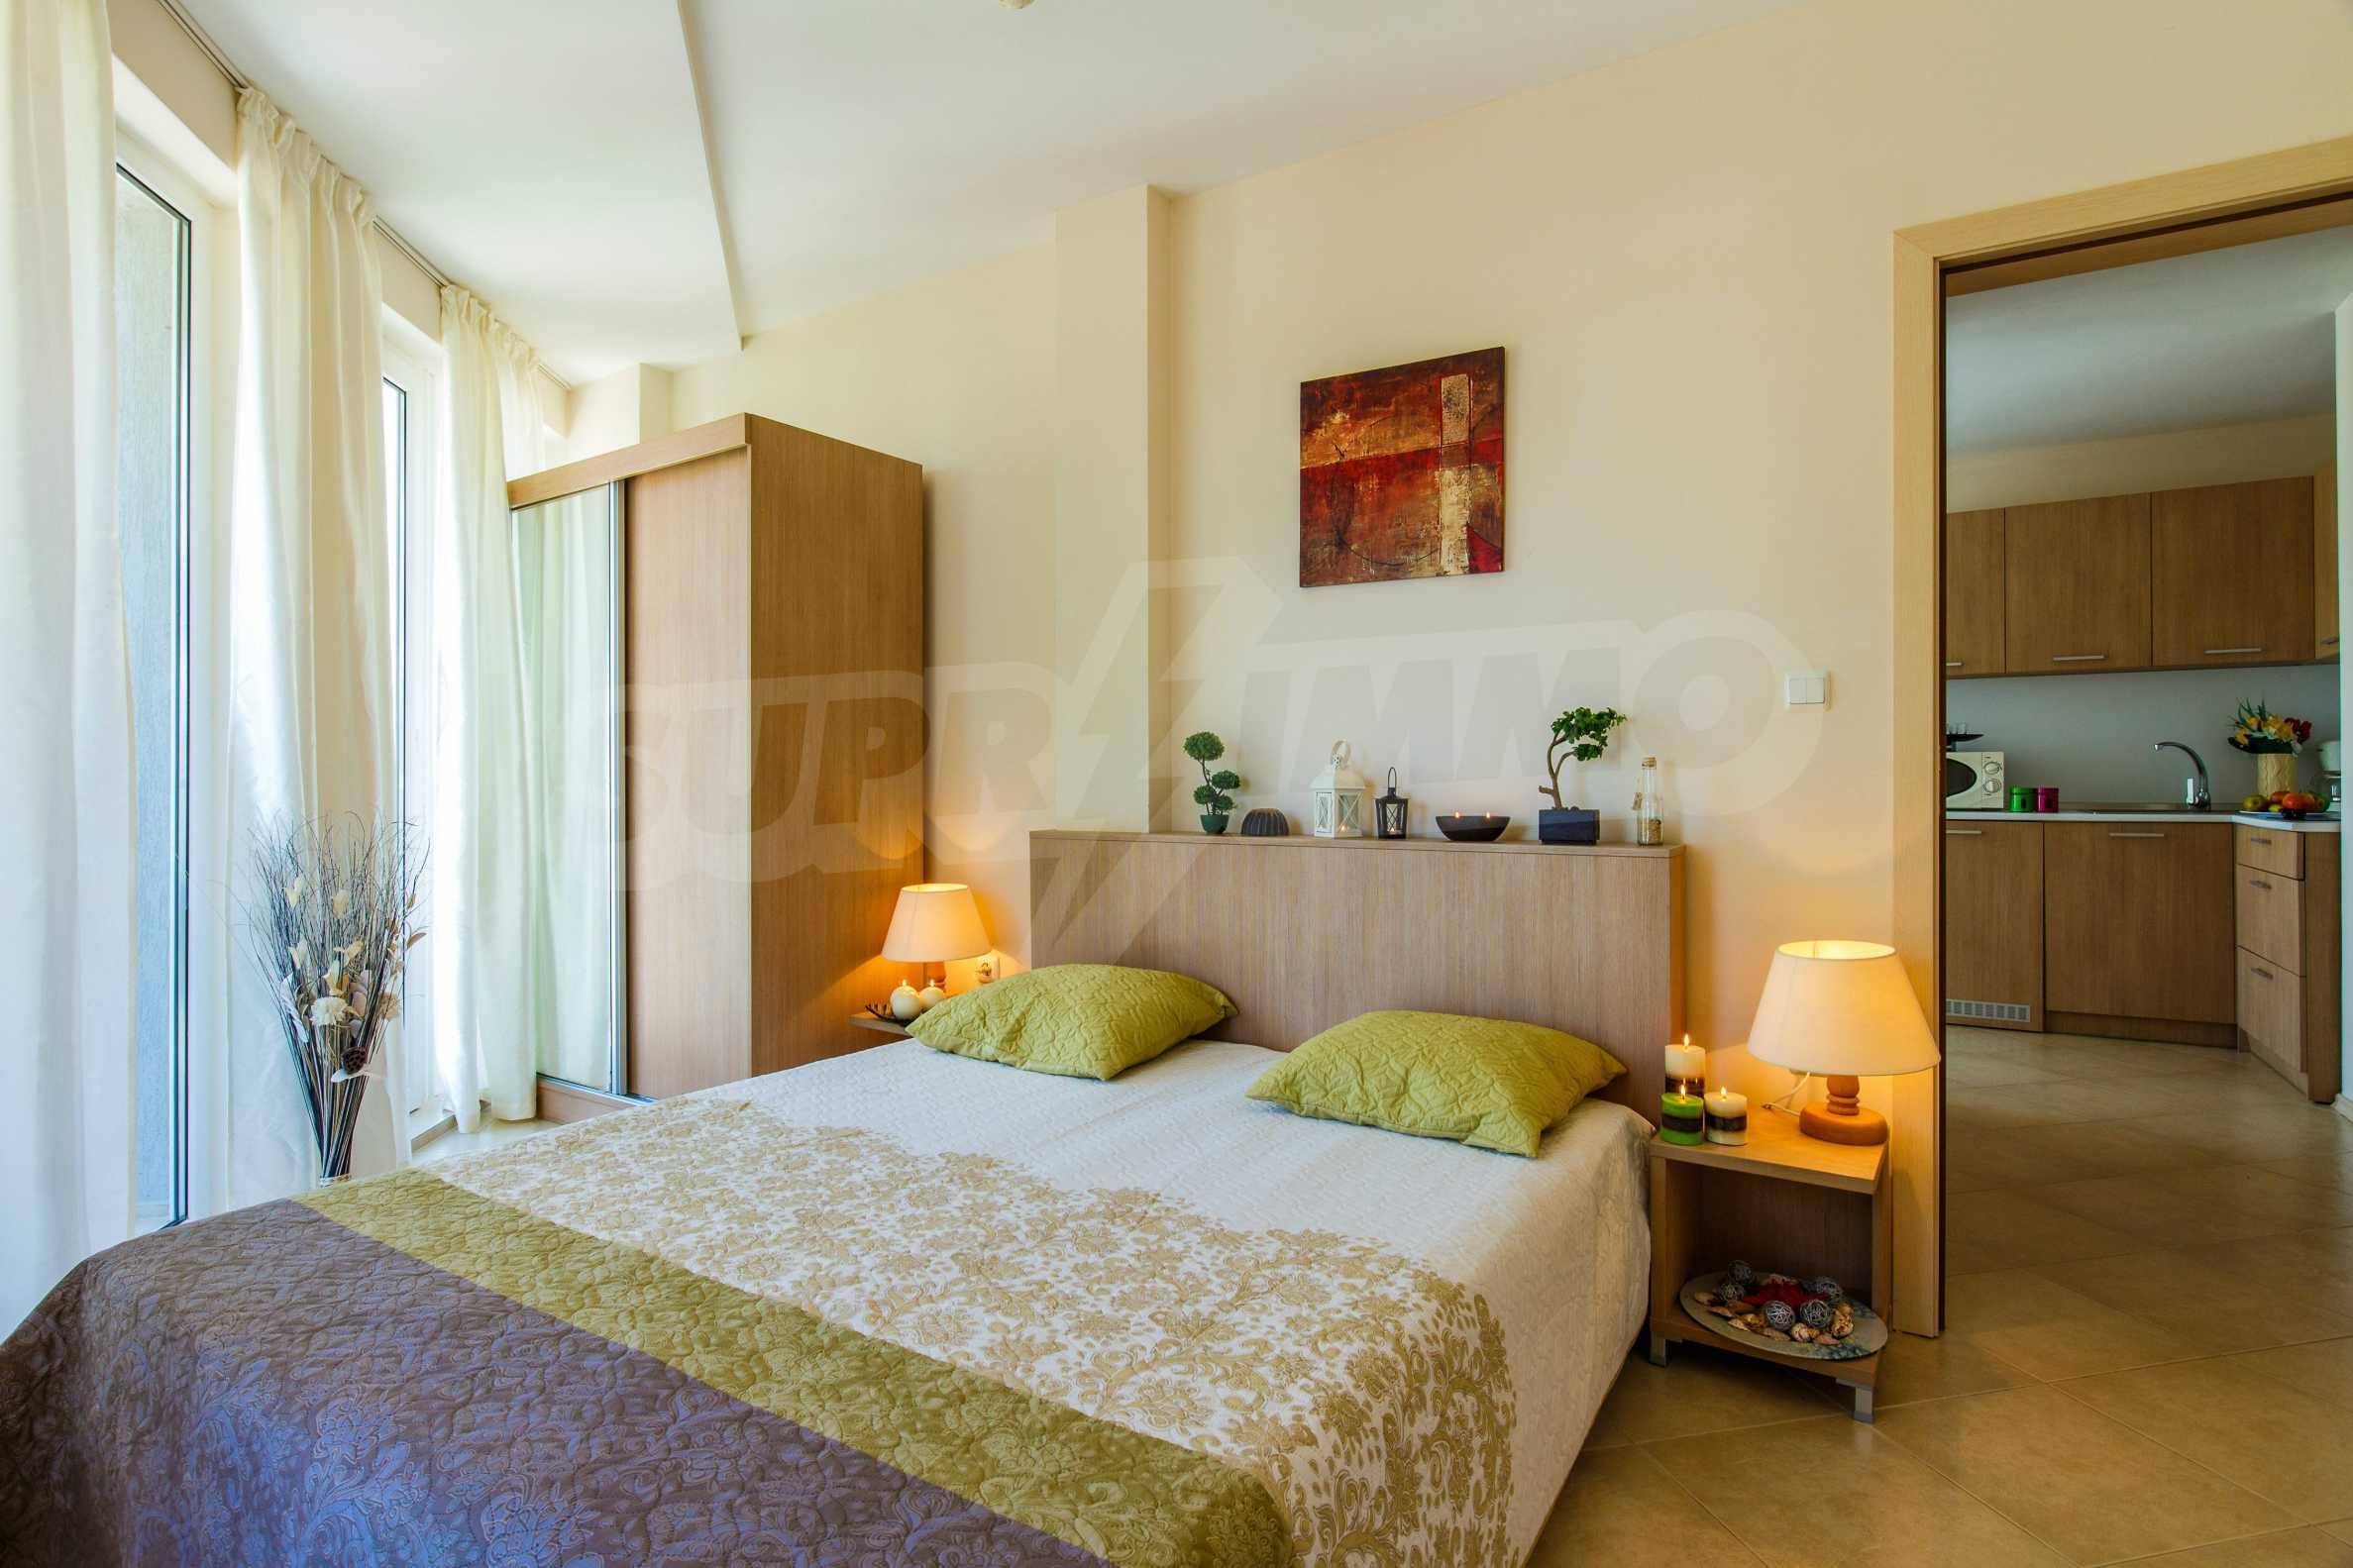 Тристаен апартамент в комплекс Емберли близо до плажа в Лозенец (ап. №423) 19